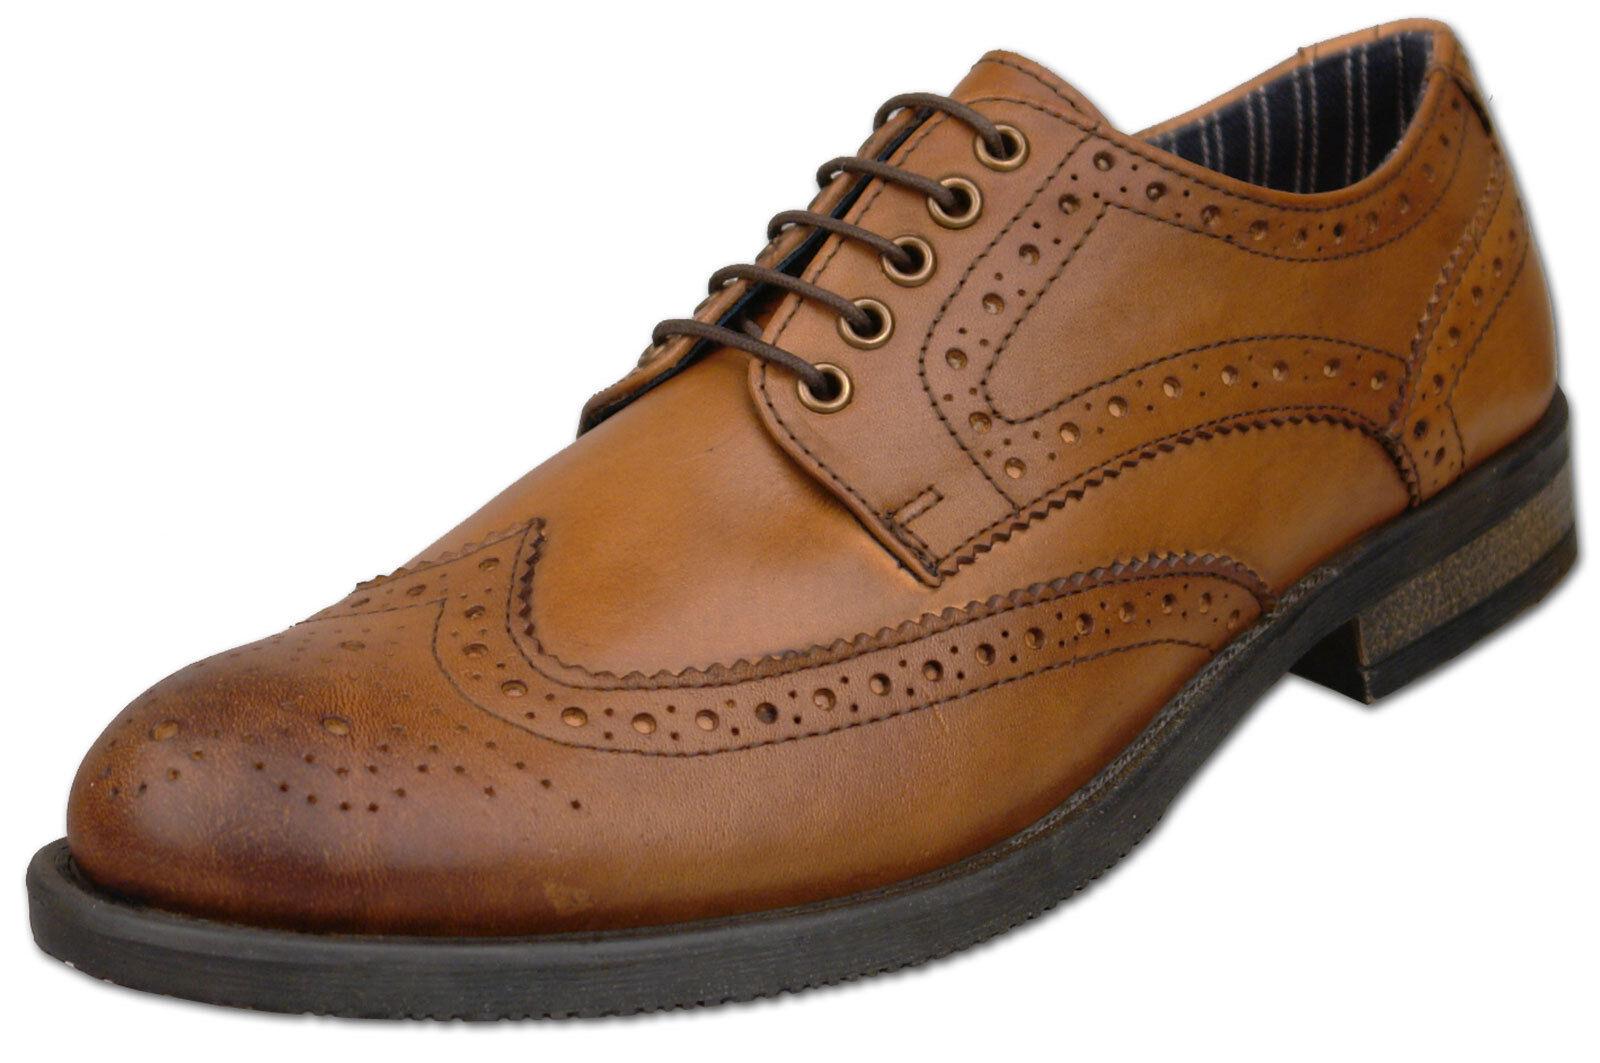 Uomo Brand New Tan Leder Lace Up Größe Formal Brogue Schuhes Größe Up 6 7 8 9 10 11 12 3c12f1